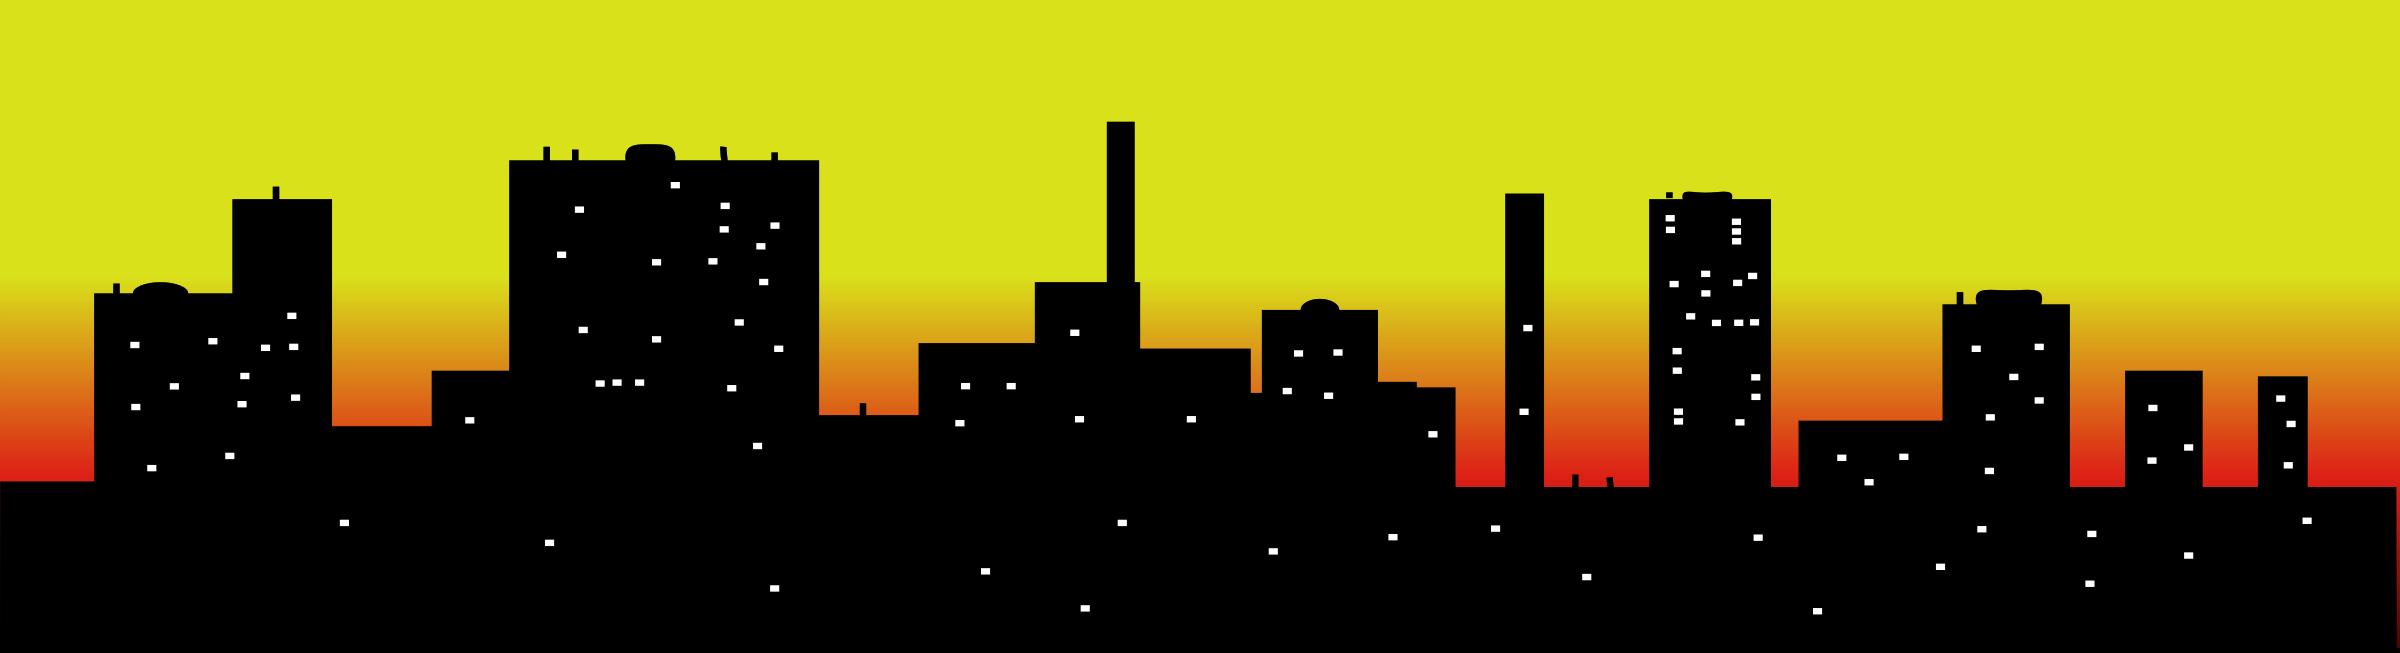 Sunset Skyline Clipart.